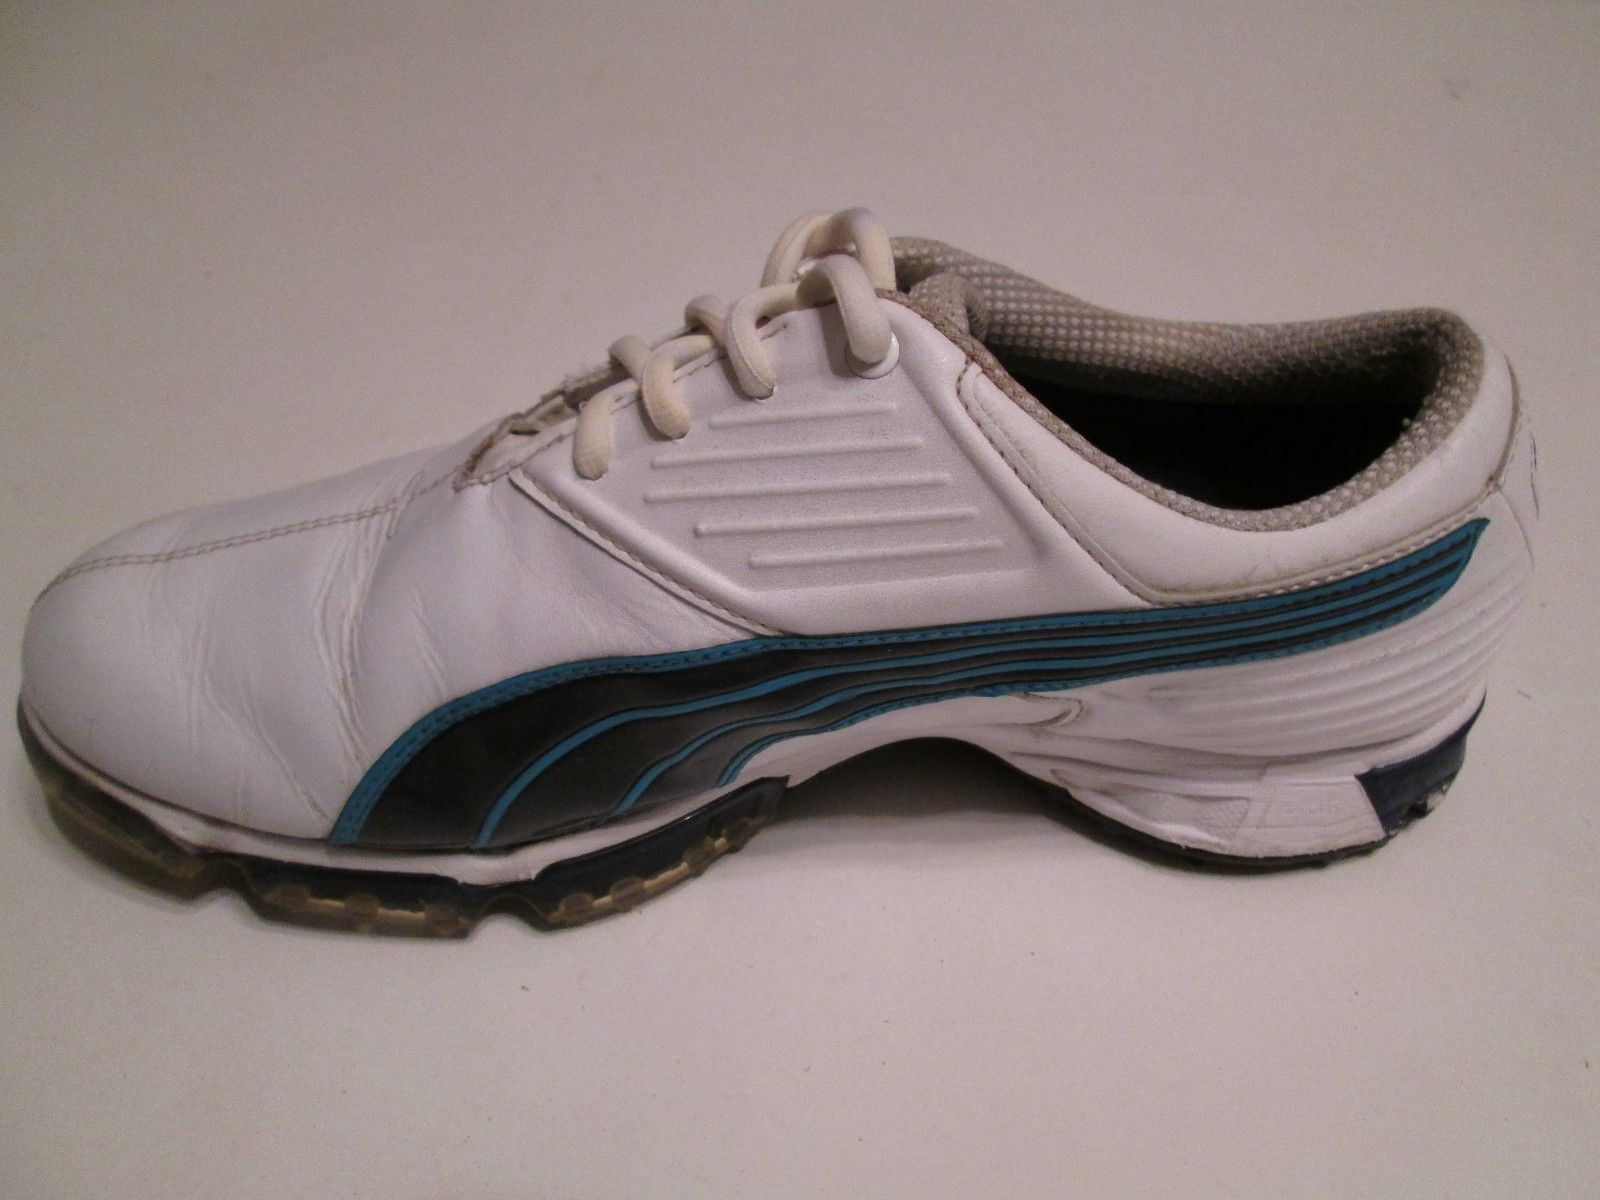 Women s Puma Spike Golf Shoes ECO OrthoLite and 50 similar items c8454599c